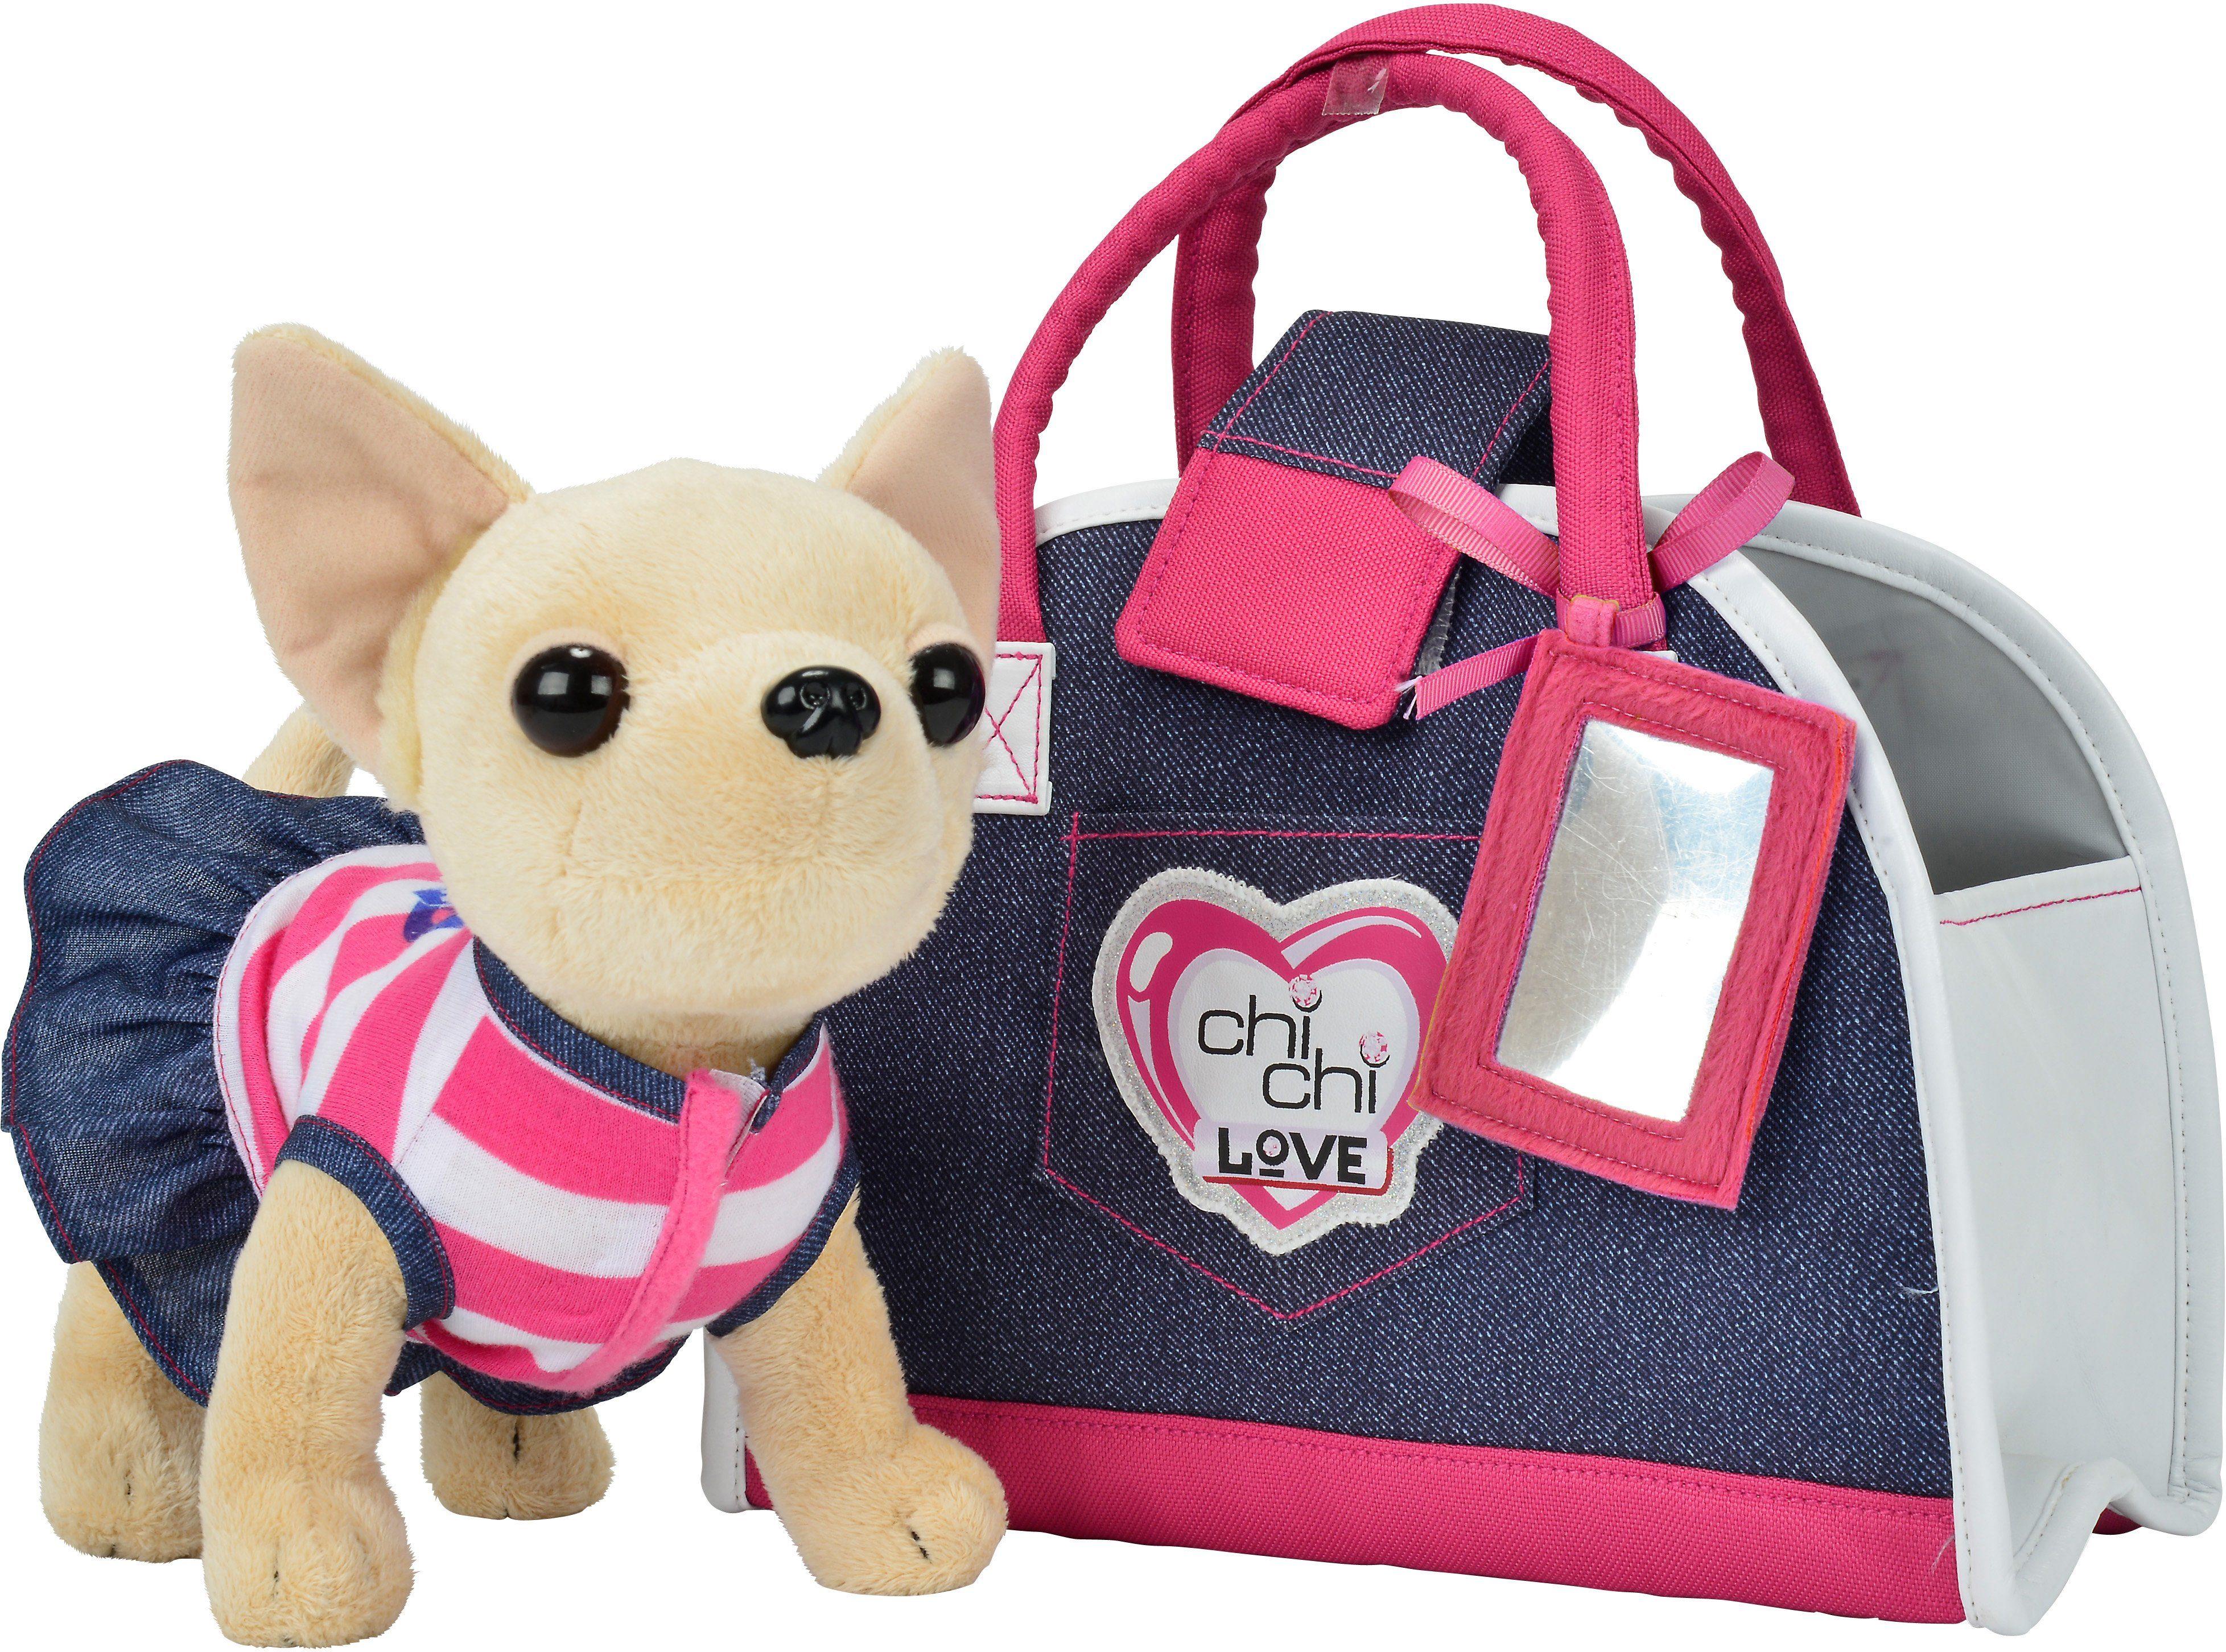 Simba Stofftier mit Tasche ca. 23 cm, »Chi Chi Love, Chihuahua Plüschhund Denim Fashion«